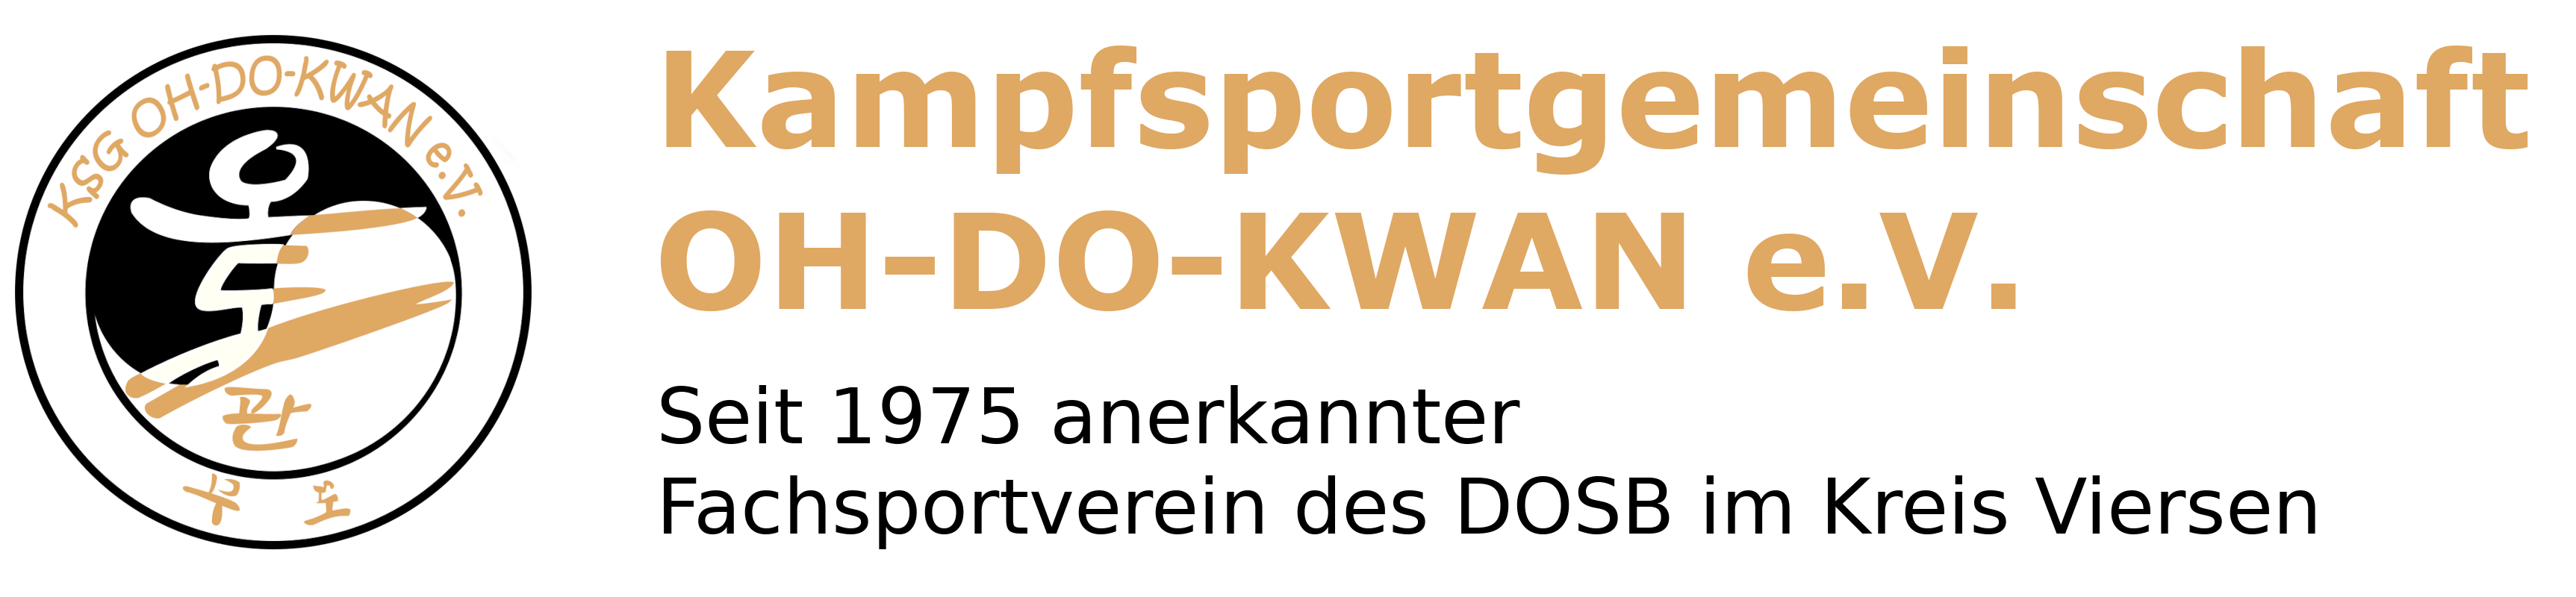 KSG OH-DO-KWAN e.V. - Kampfsport, Taekwondo, Hapkido, Kick-/Thaiboxen - Disziplin, Selbstbewusstsein, Fitness, Sicherheit, Ausgeglichenheit